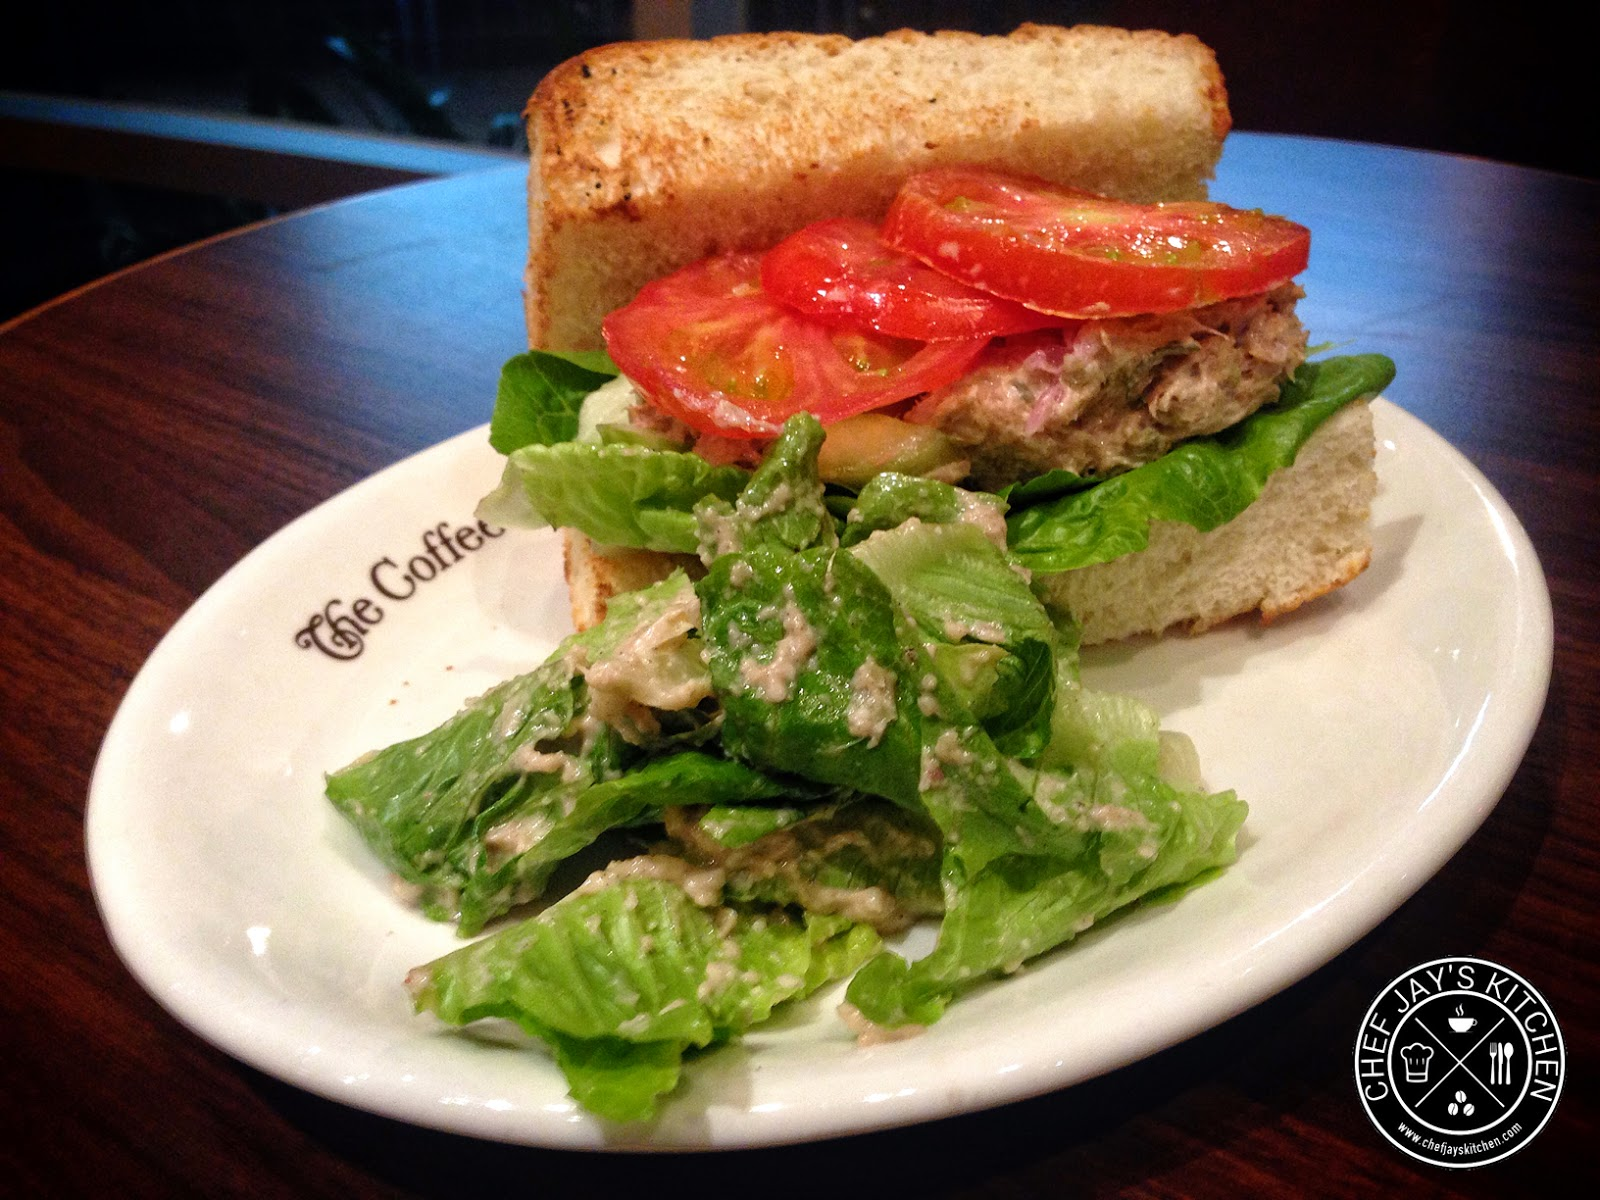 The Coffee Bean & Tea Leaf - CBTL Chef's Tuna Sandwich